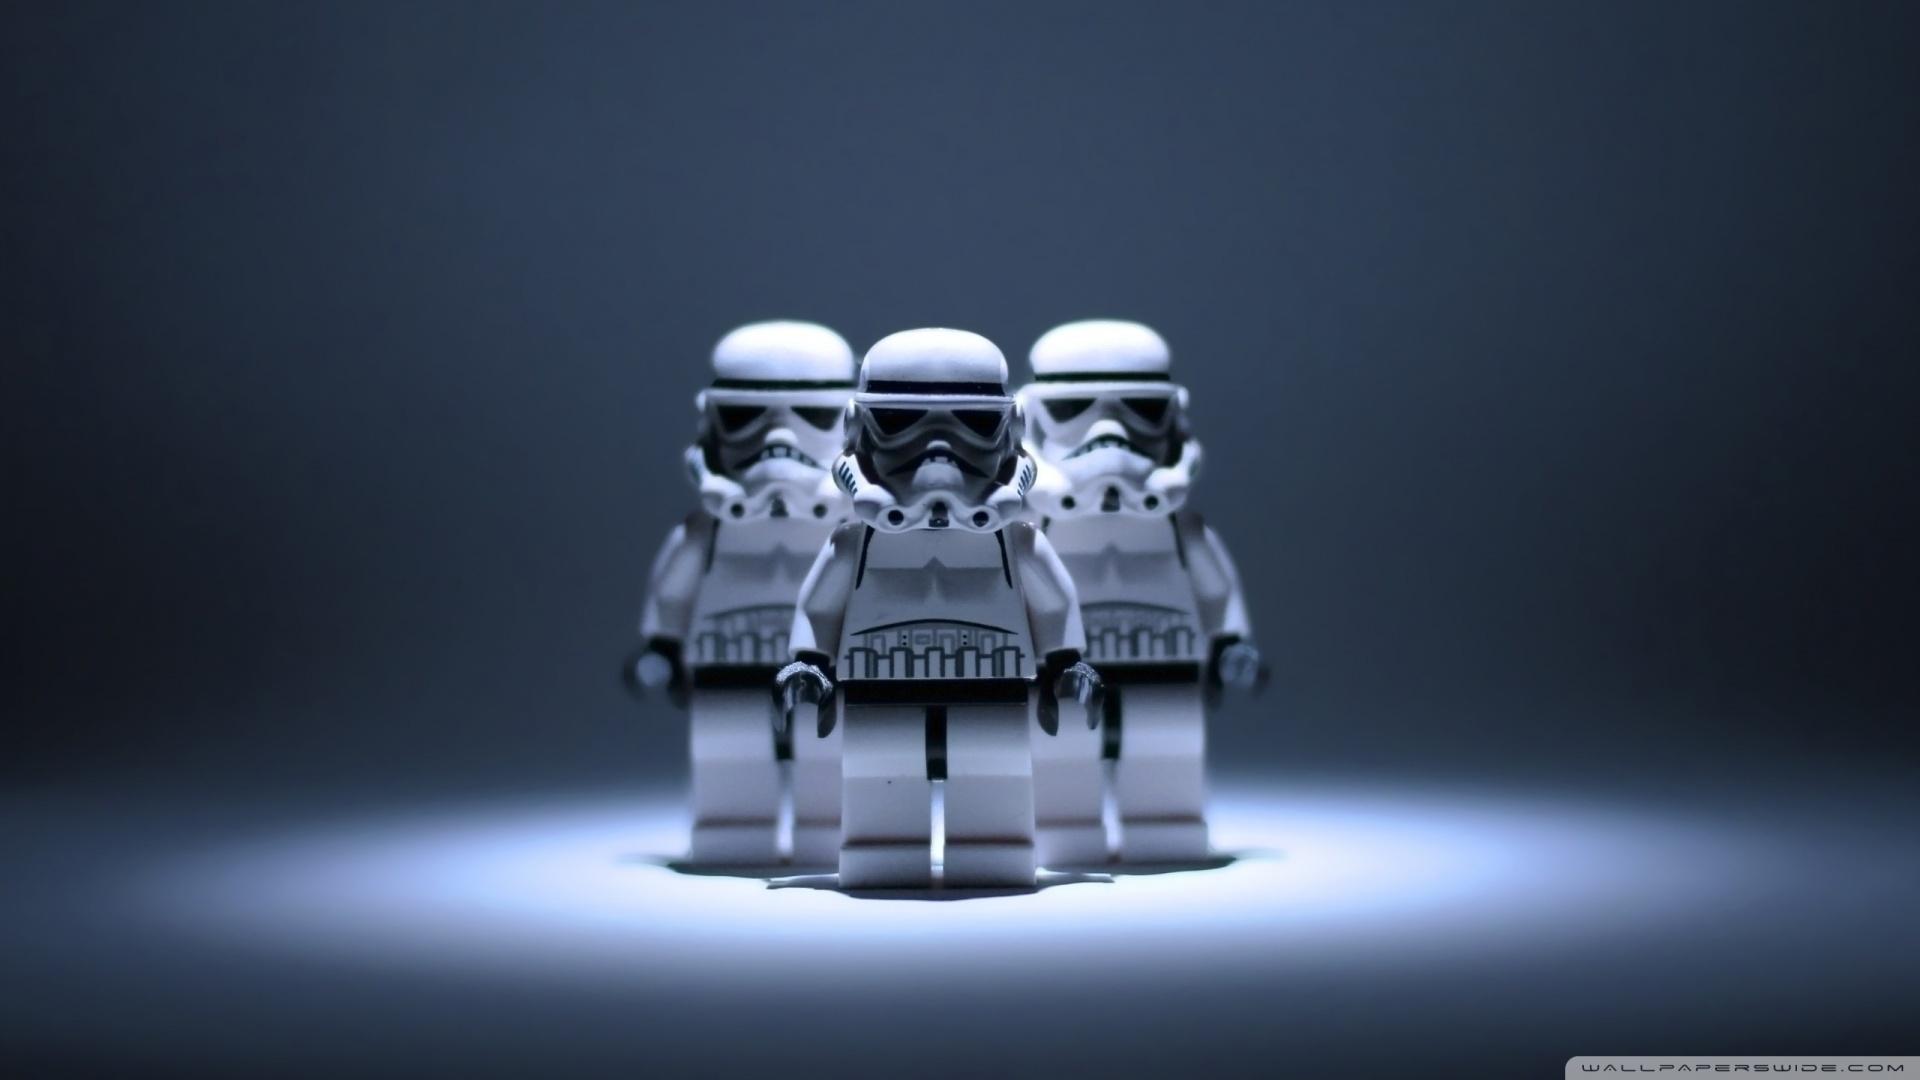 Star Wars Lego Stormtrooper Wallpaper 1920x1080 Star Wars Lego 1920x1080